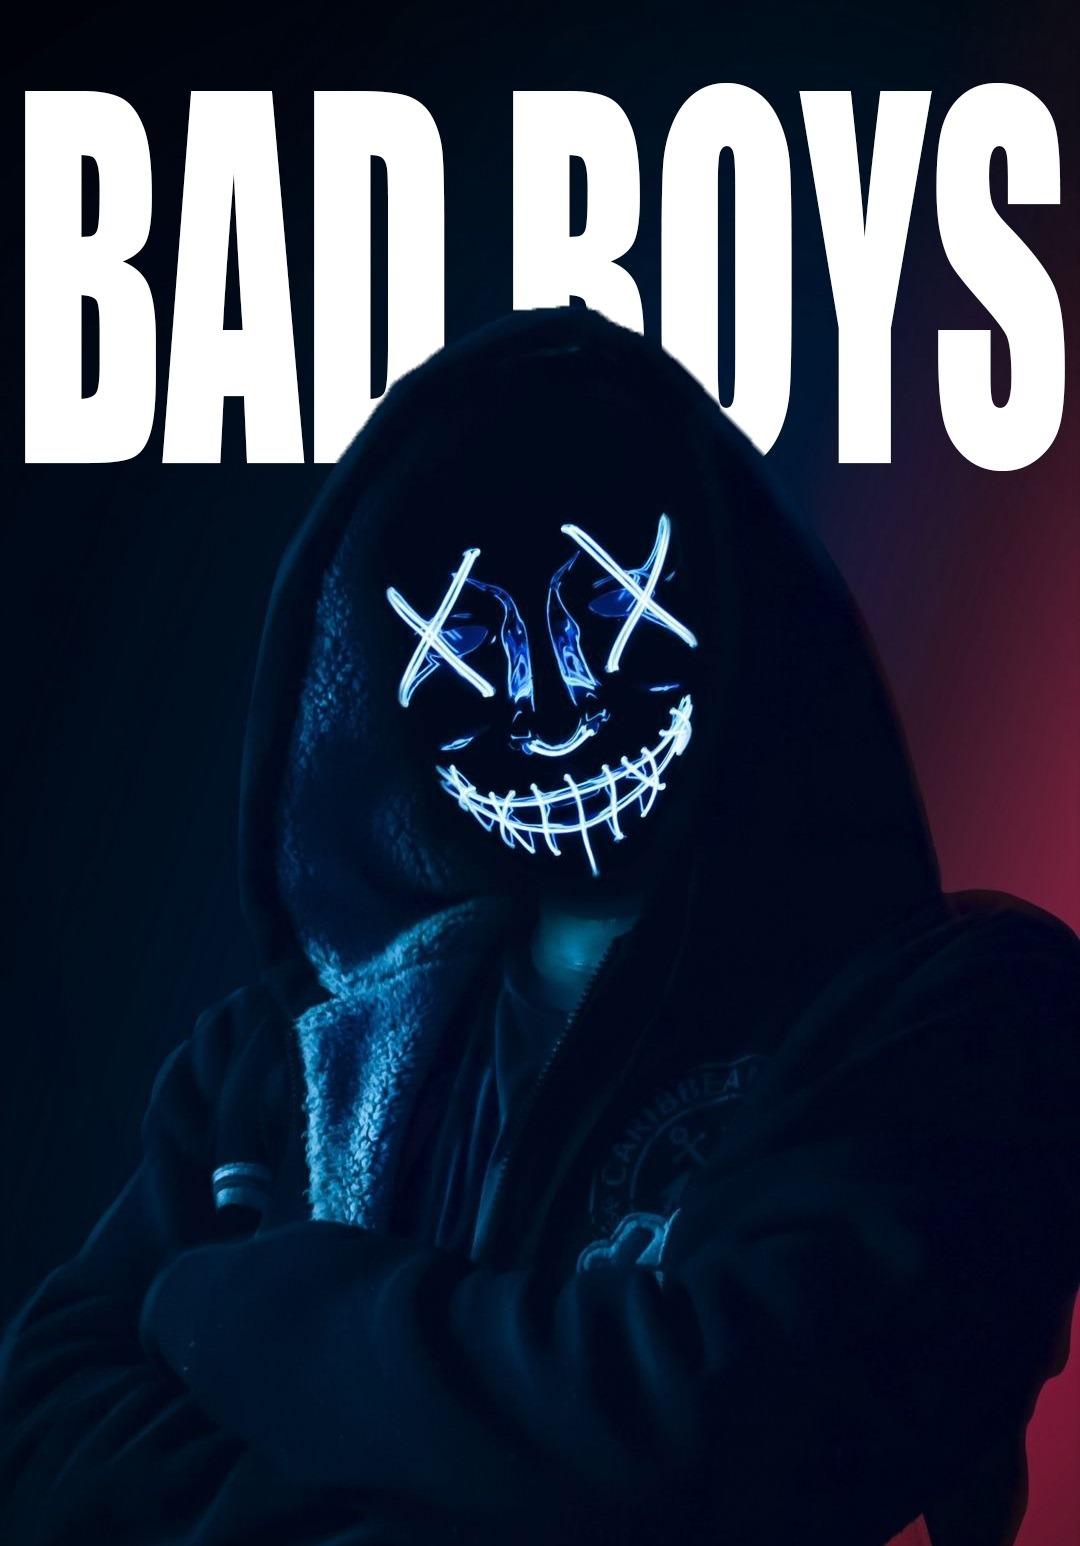 stylish bad boy dp